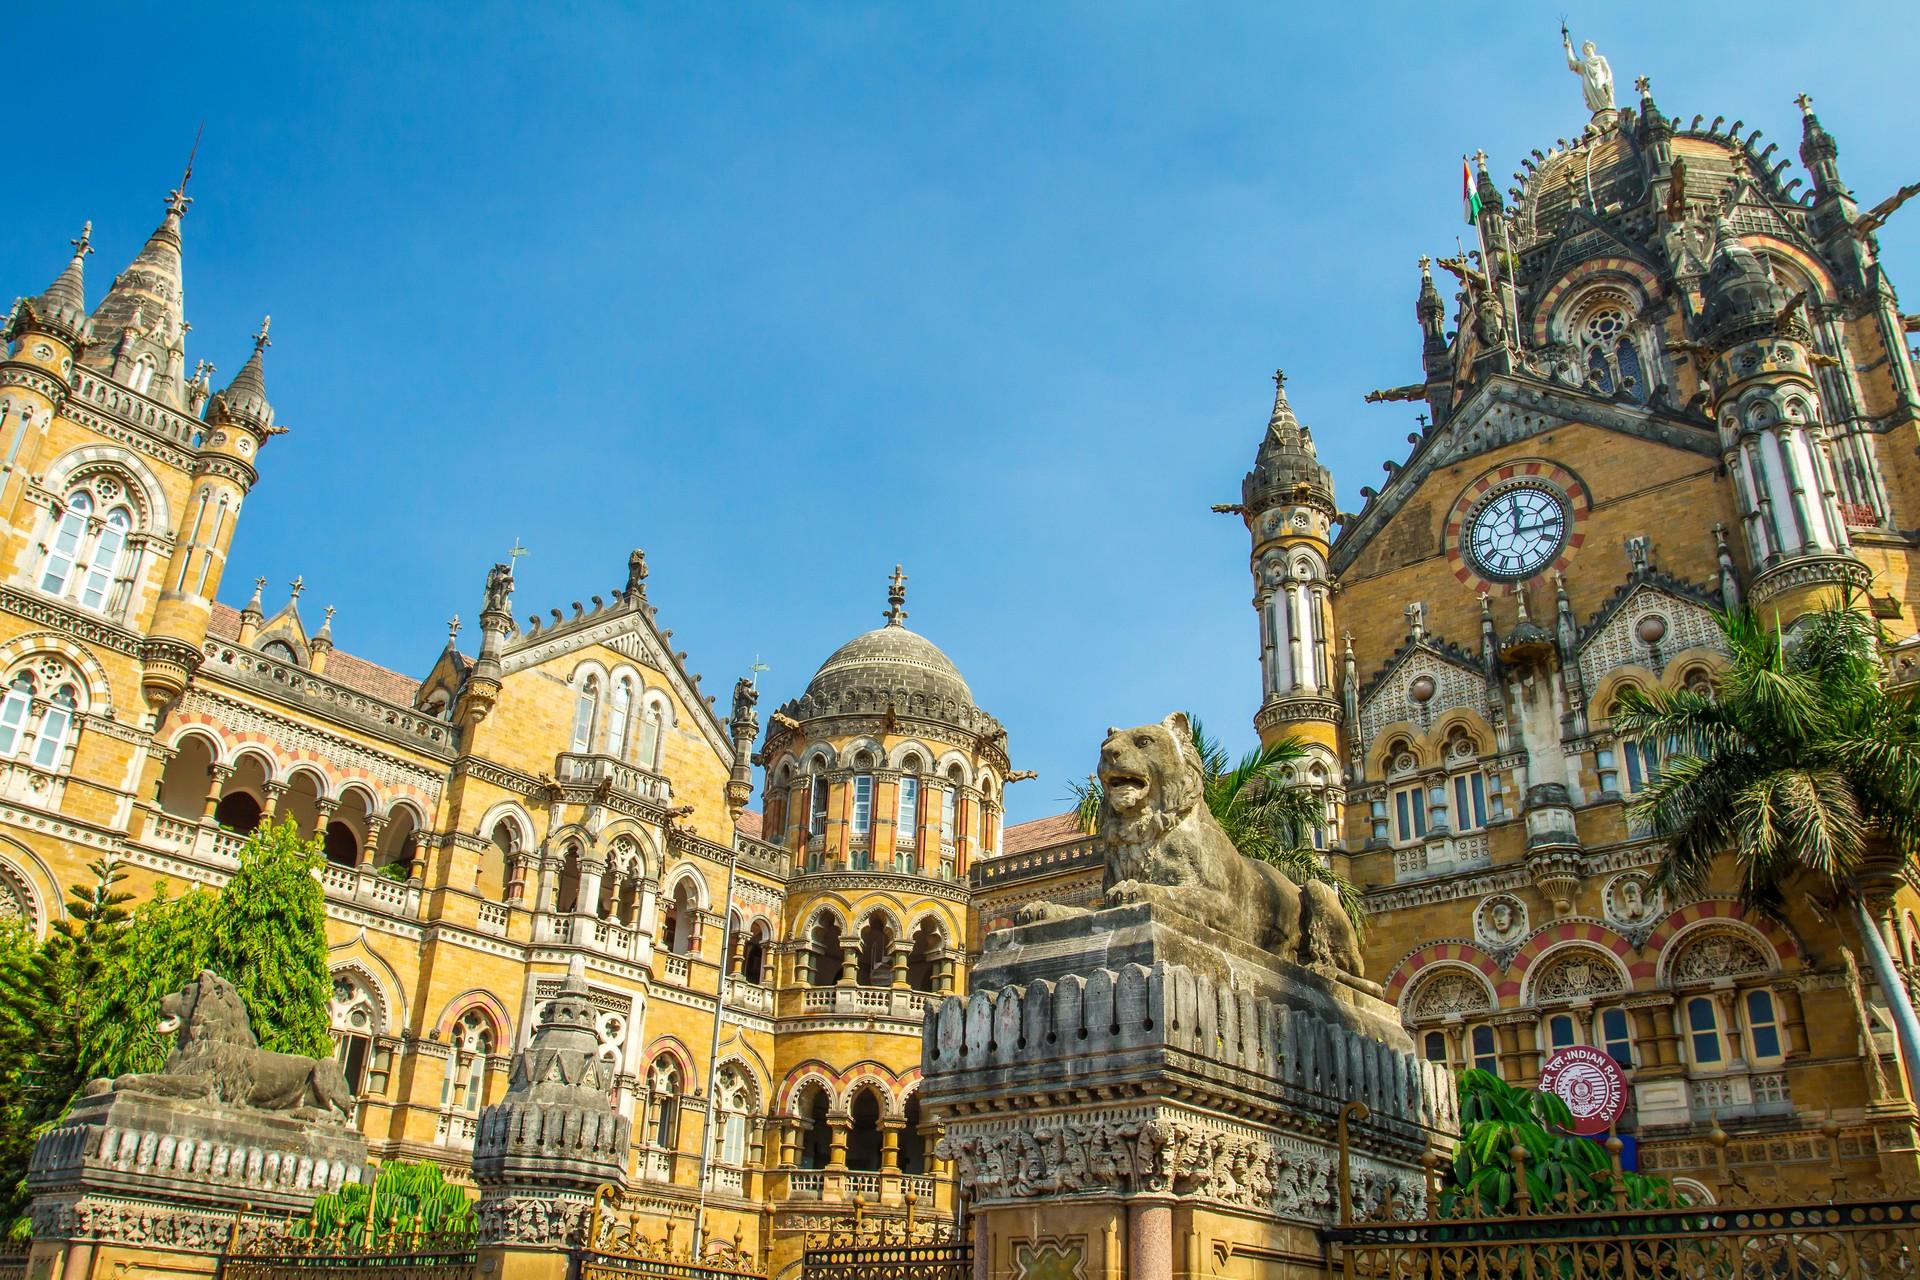 Shantaram is set in 1980s Bombay, now called Mumbai